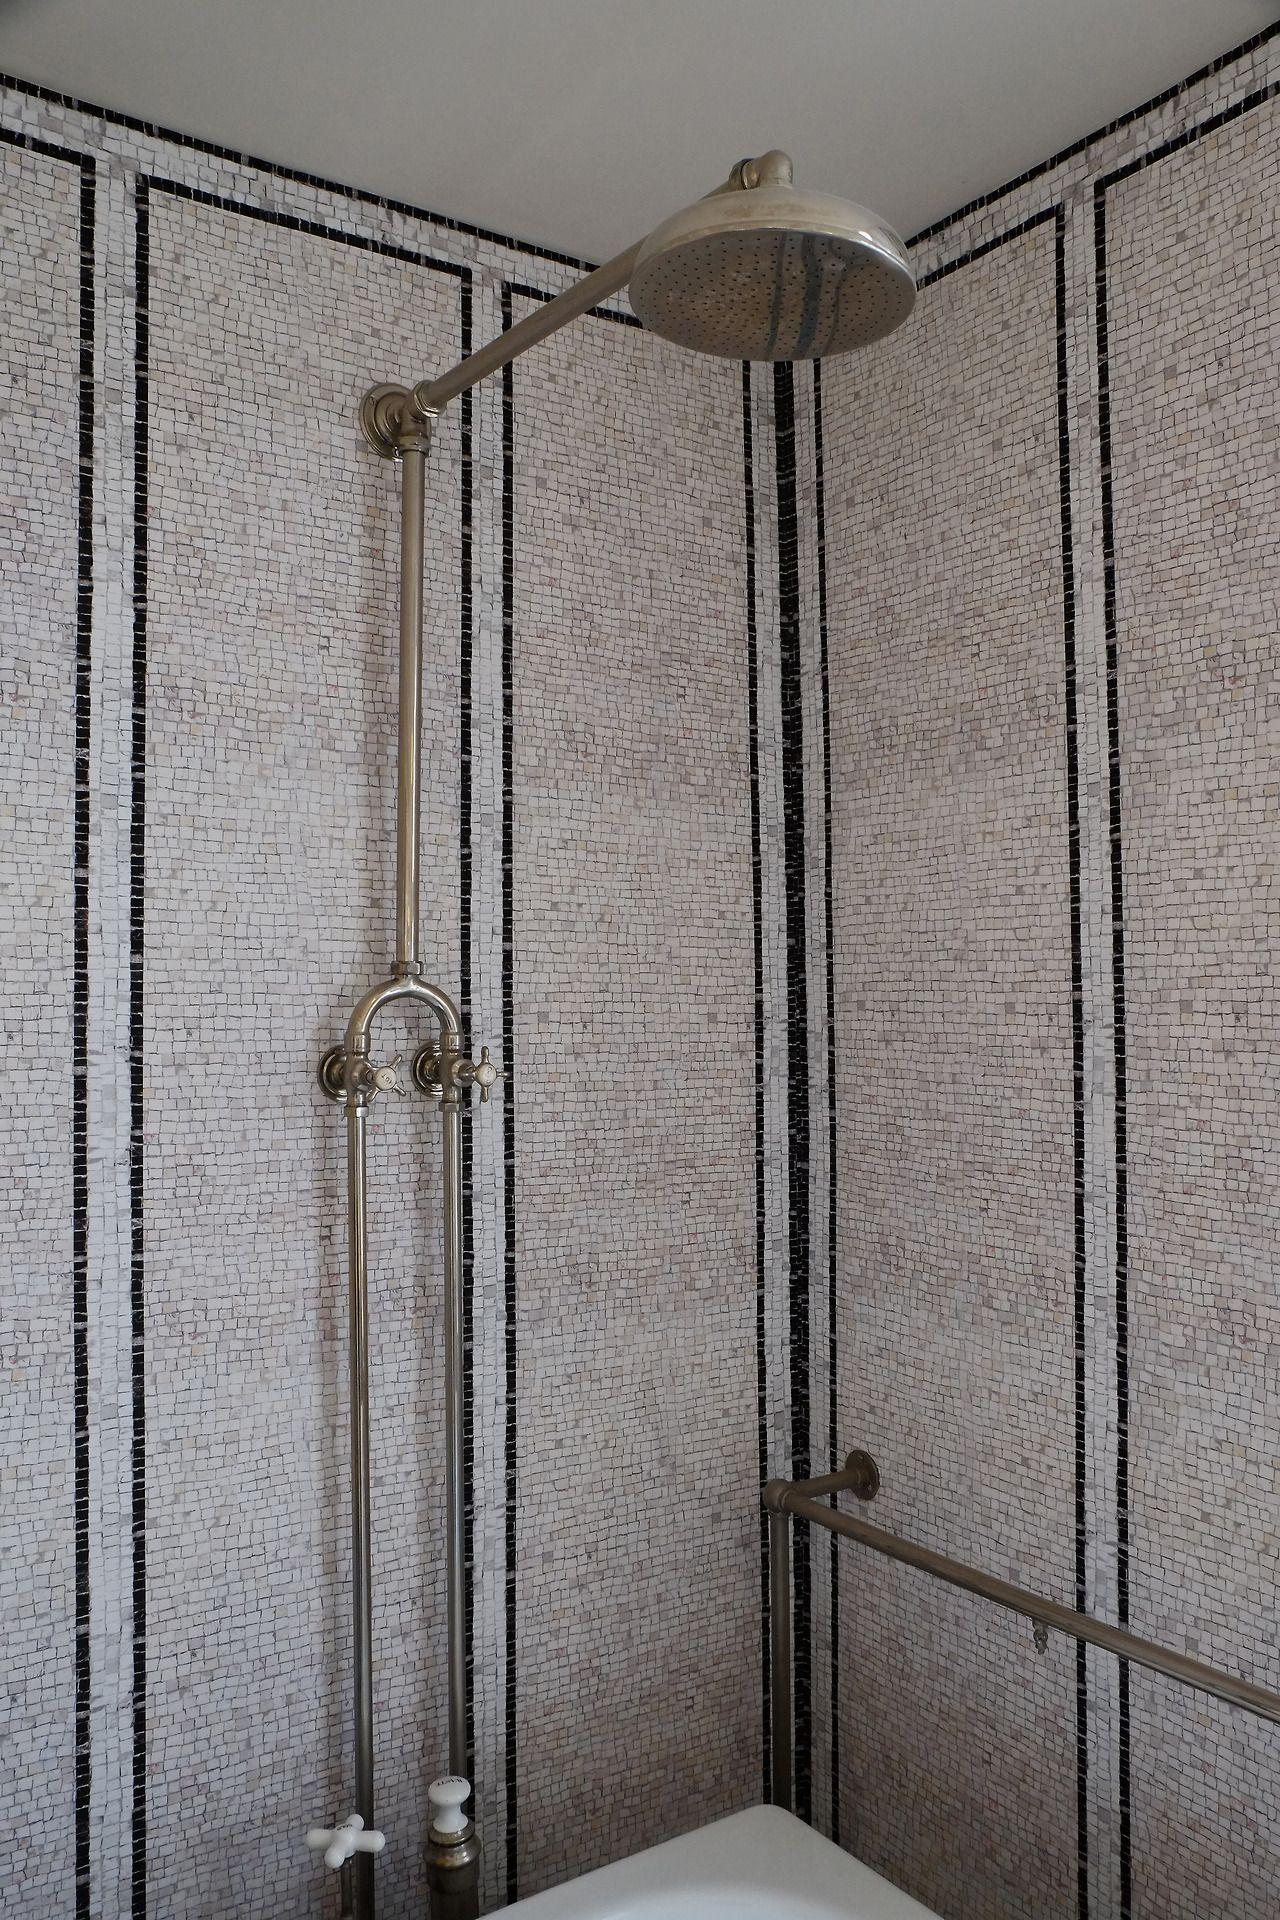 VESPER INTERIOR : Black and White Mosaic tile shower. | Design ...